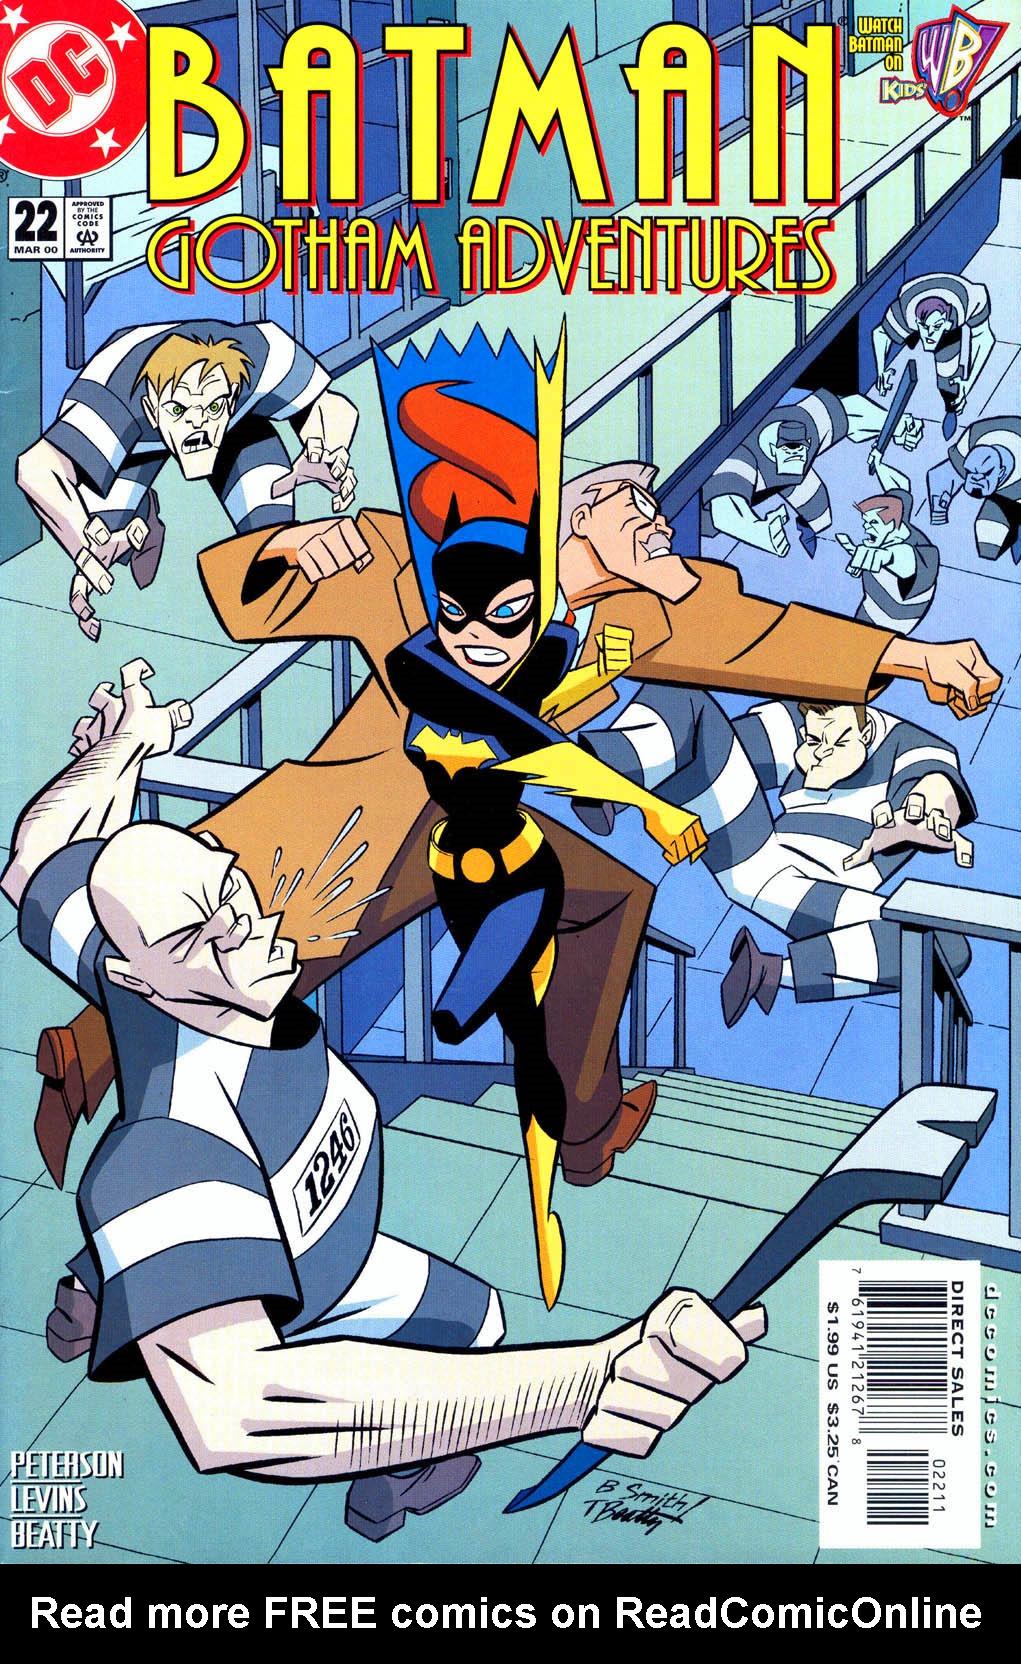 Batman: Gotham Adventures 22 Page 1